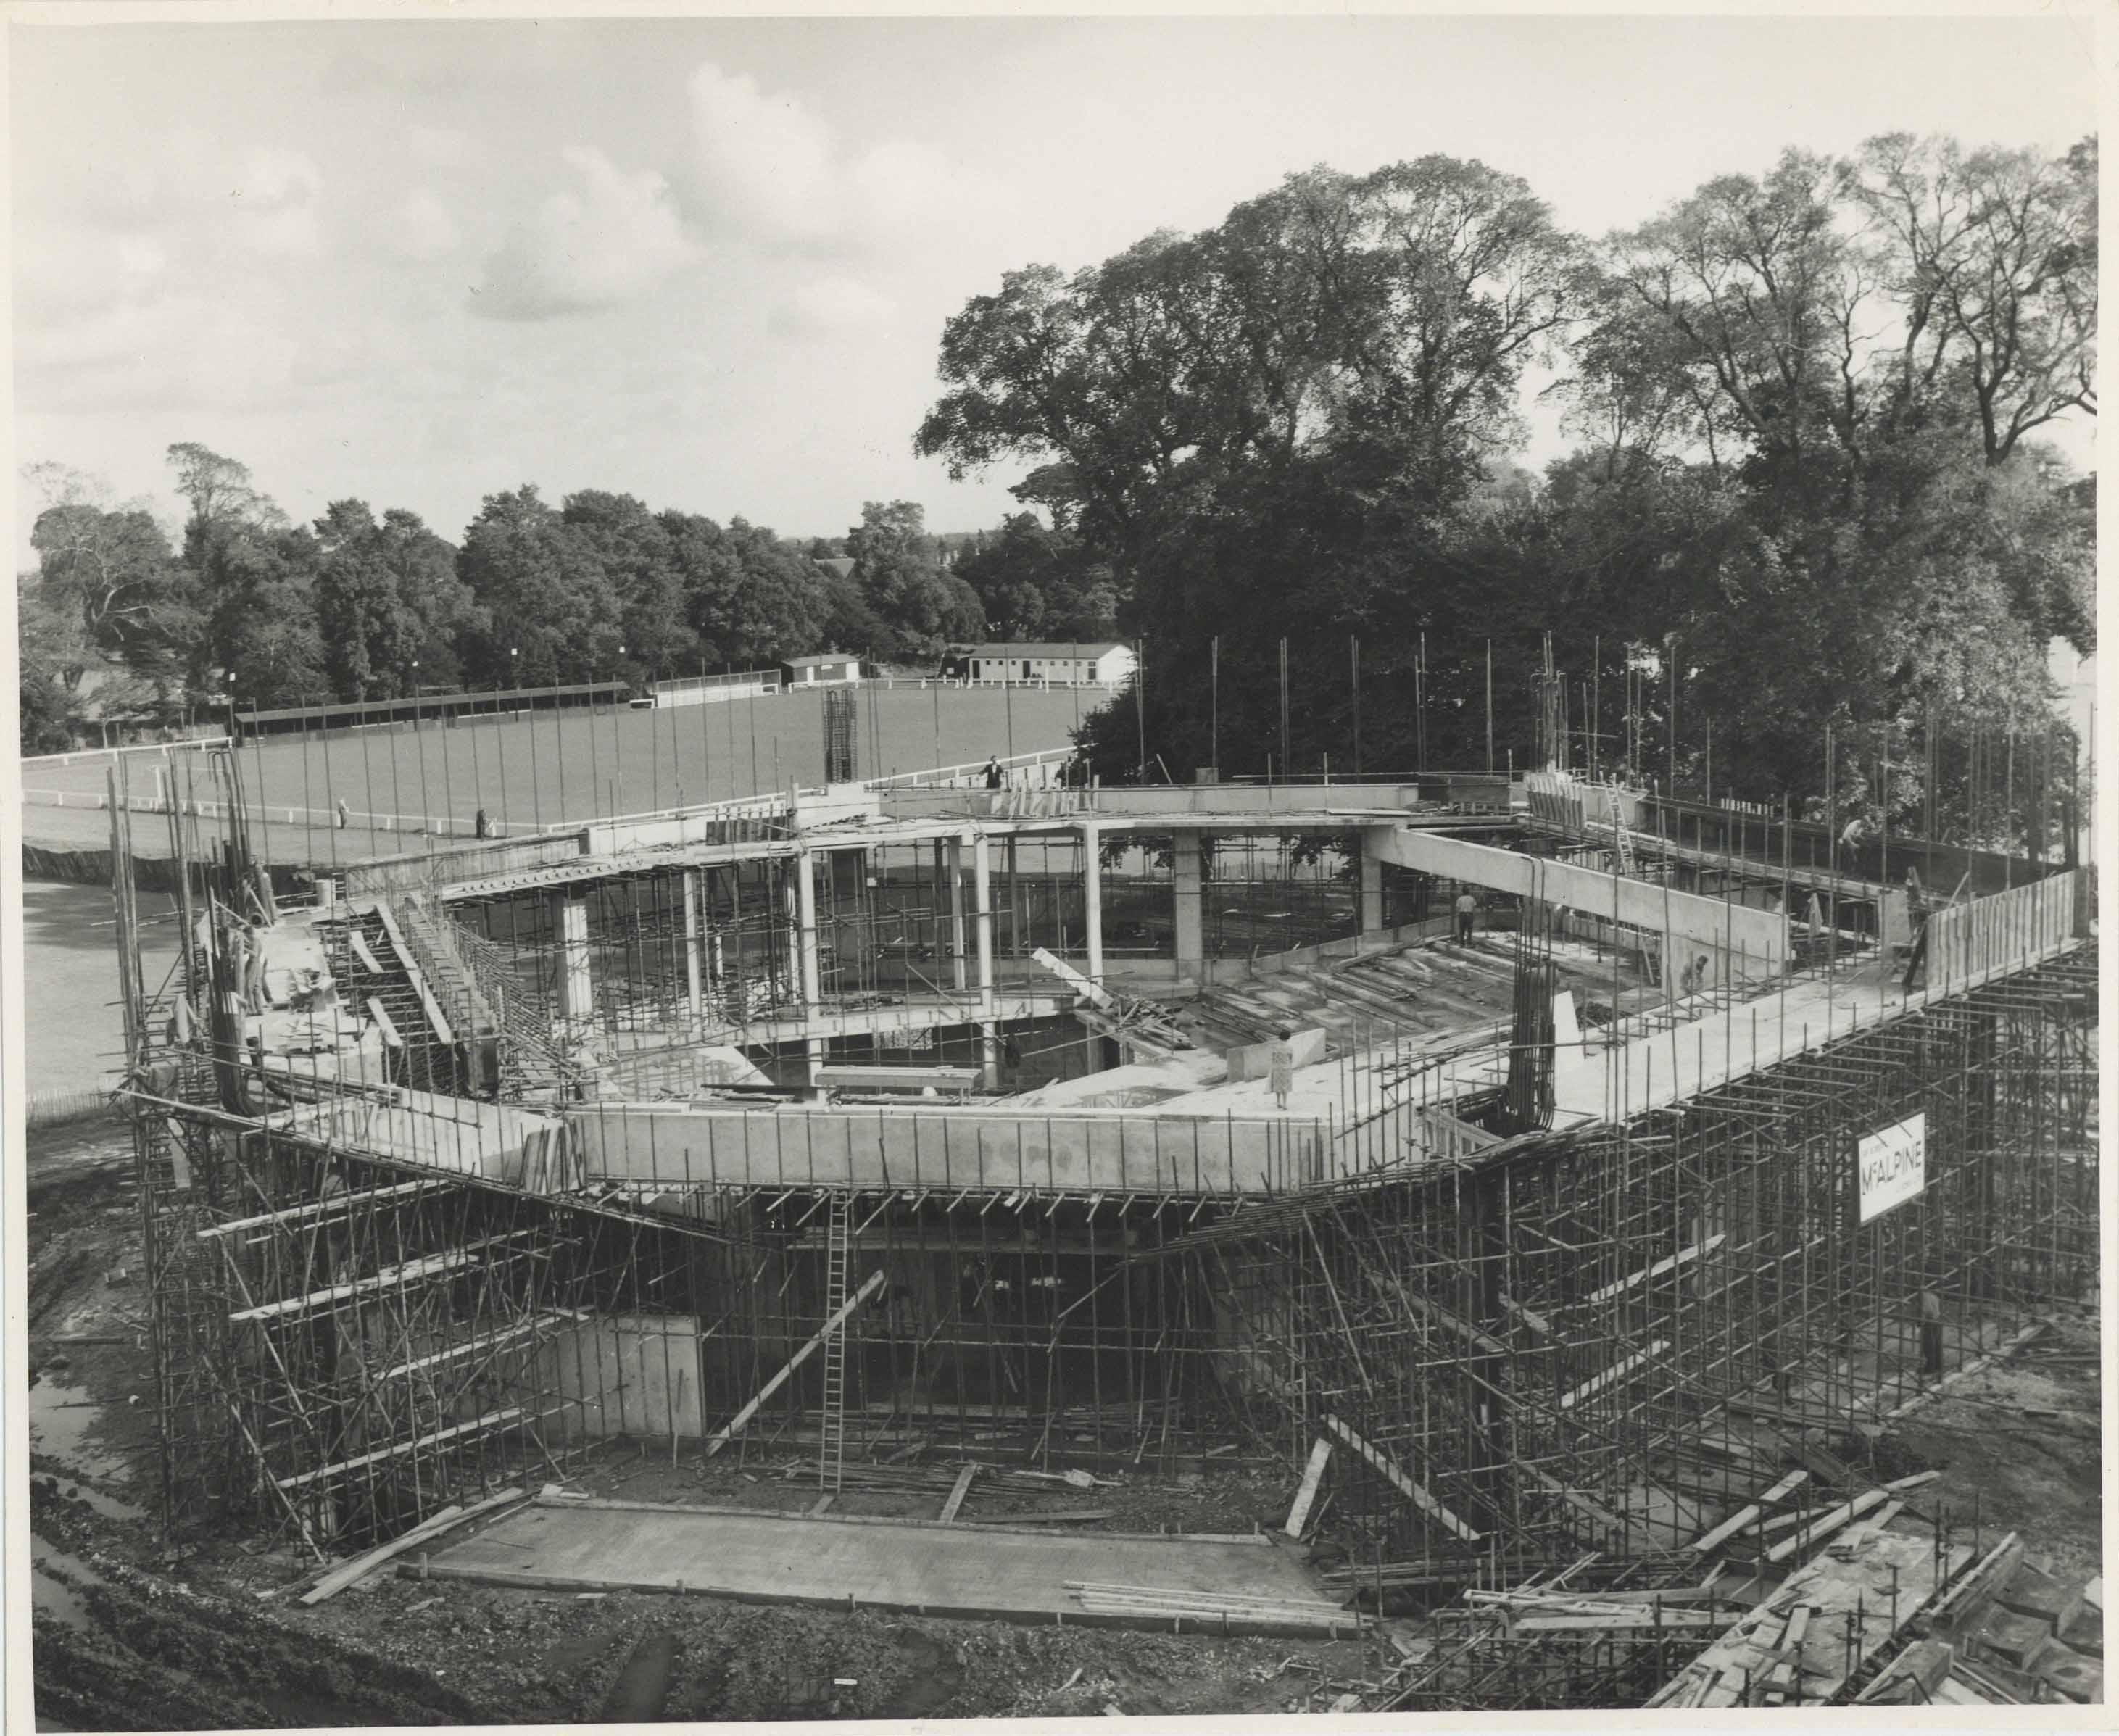 Photograph Construction Aerial Cantilever Exterior Festival Theatre - Photographer unknown - 1960s - Box 71 CFT WSRO